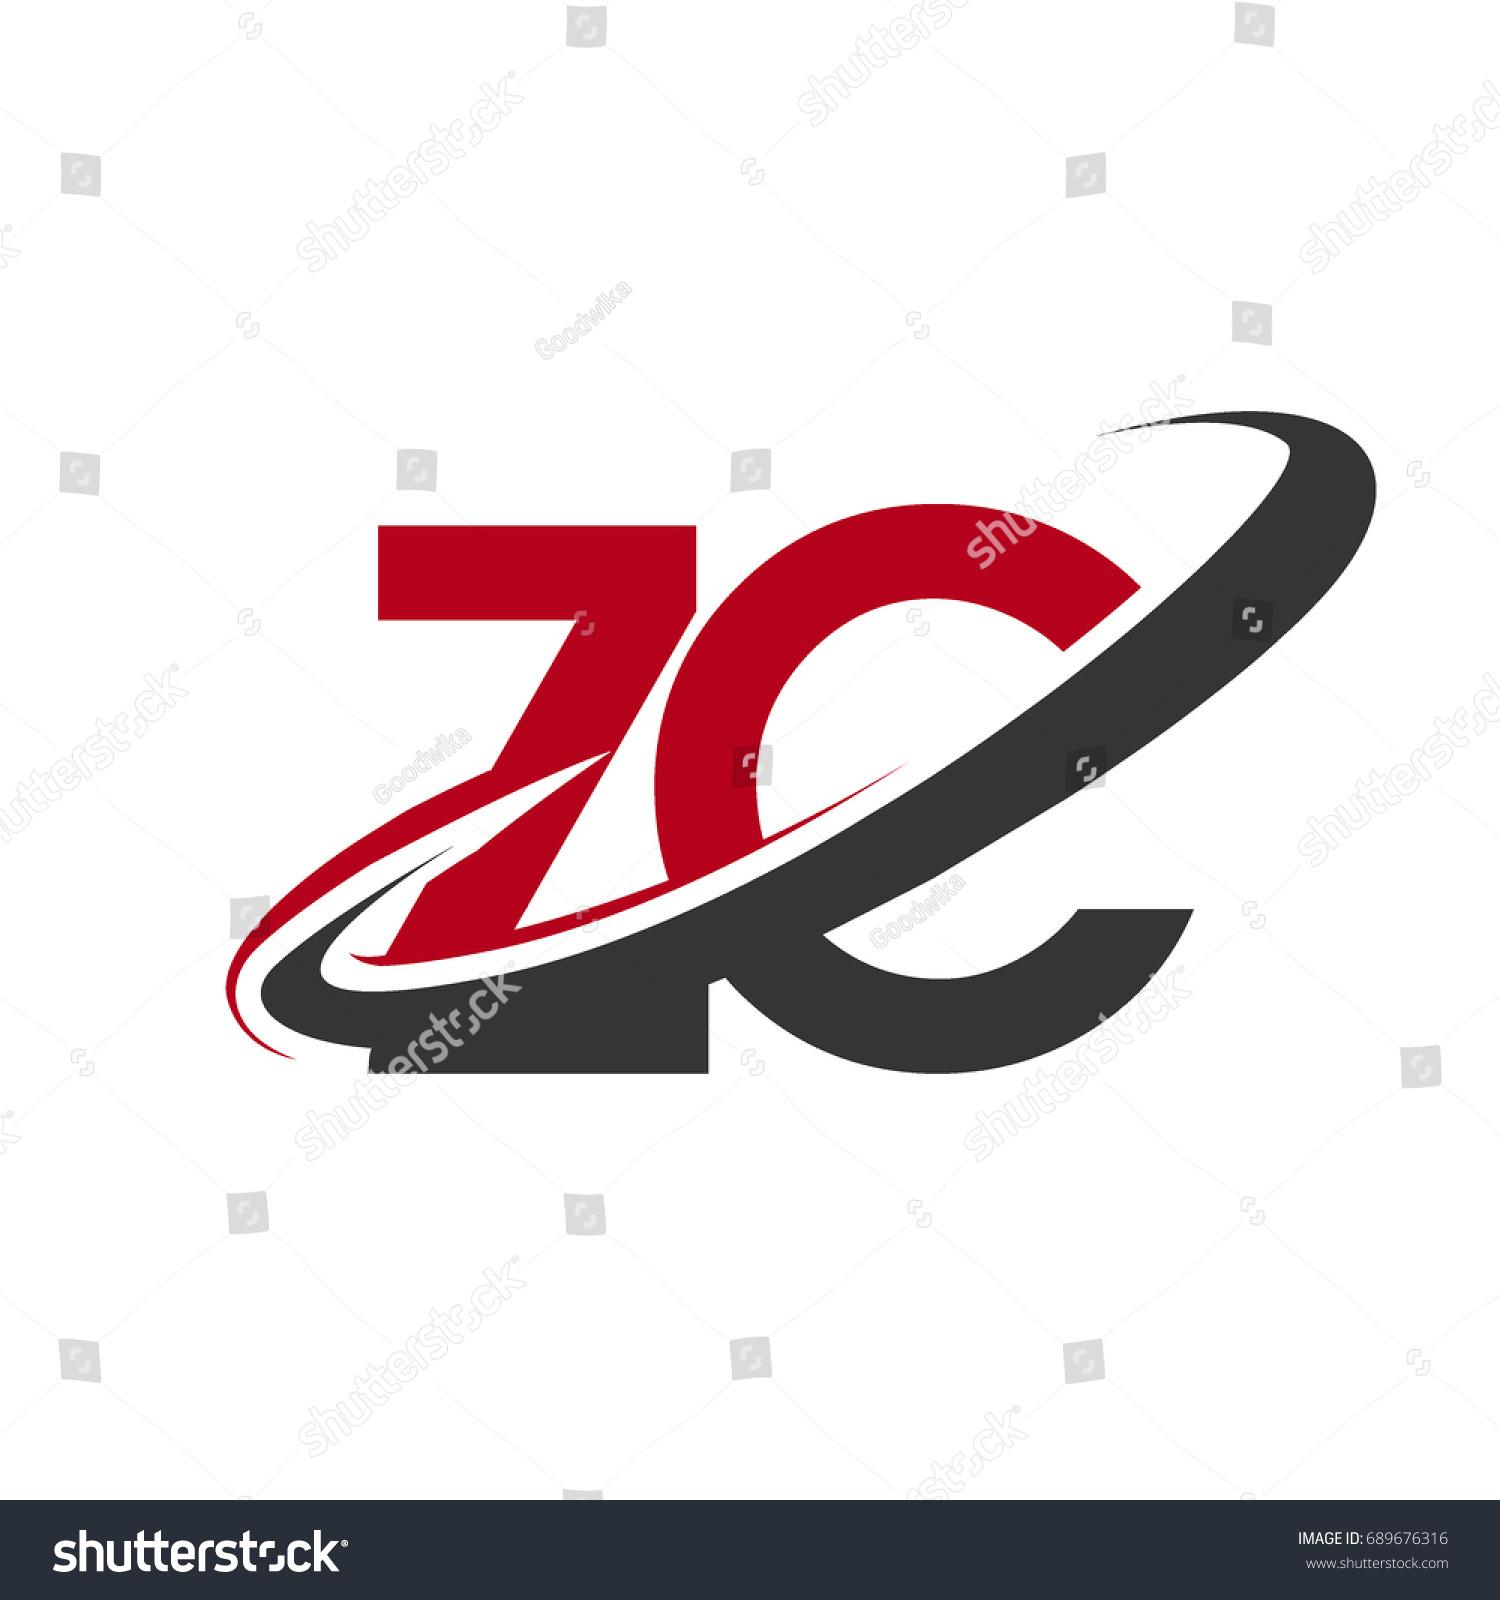 Zc initial logo company name colored stock vector 689676316 zc initial logo company name colored stock vector 689676316 shutterstock buycottarizona